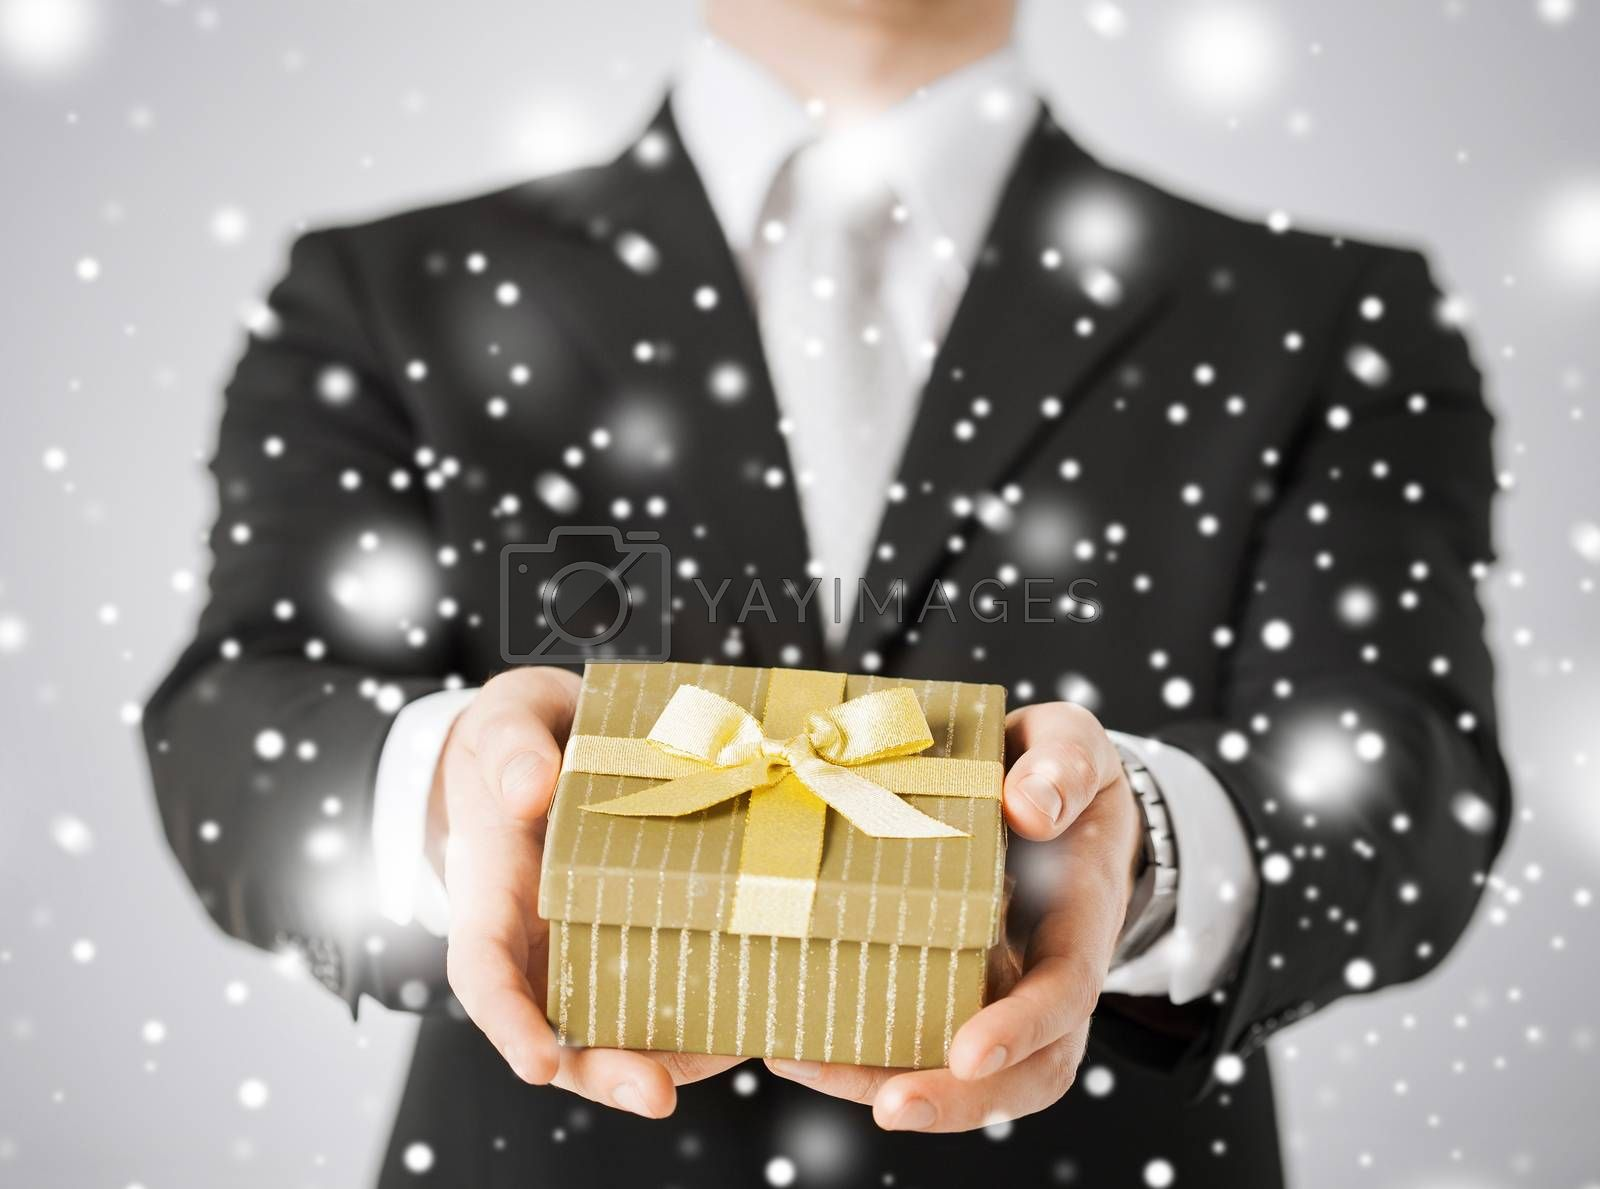 love, romance, holiday, celebration concept - man giving gift box